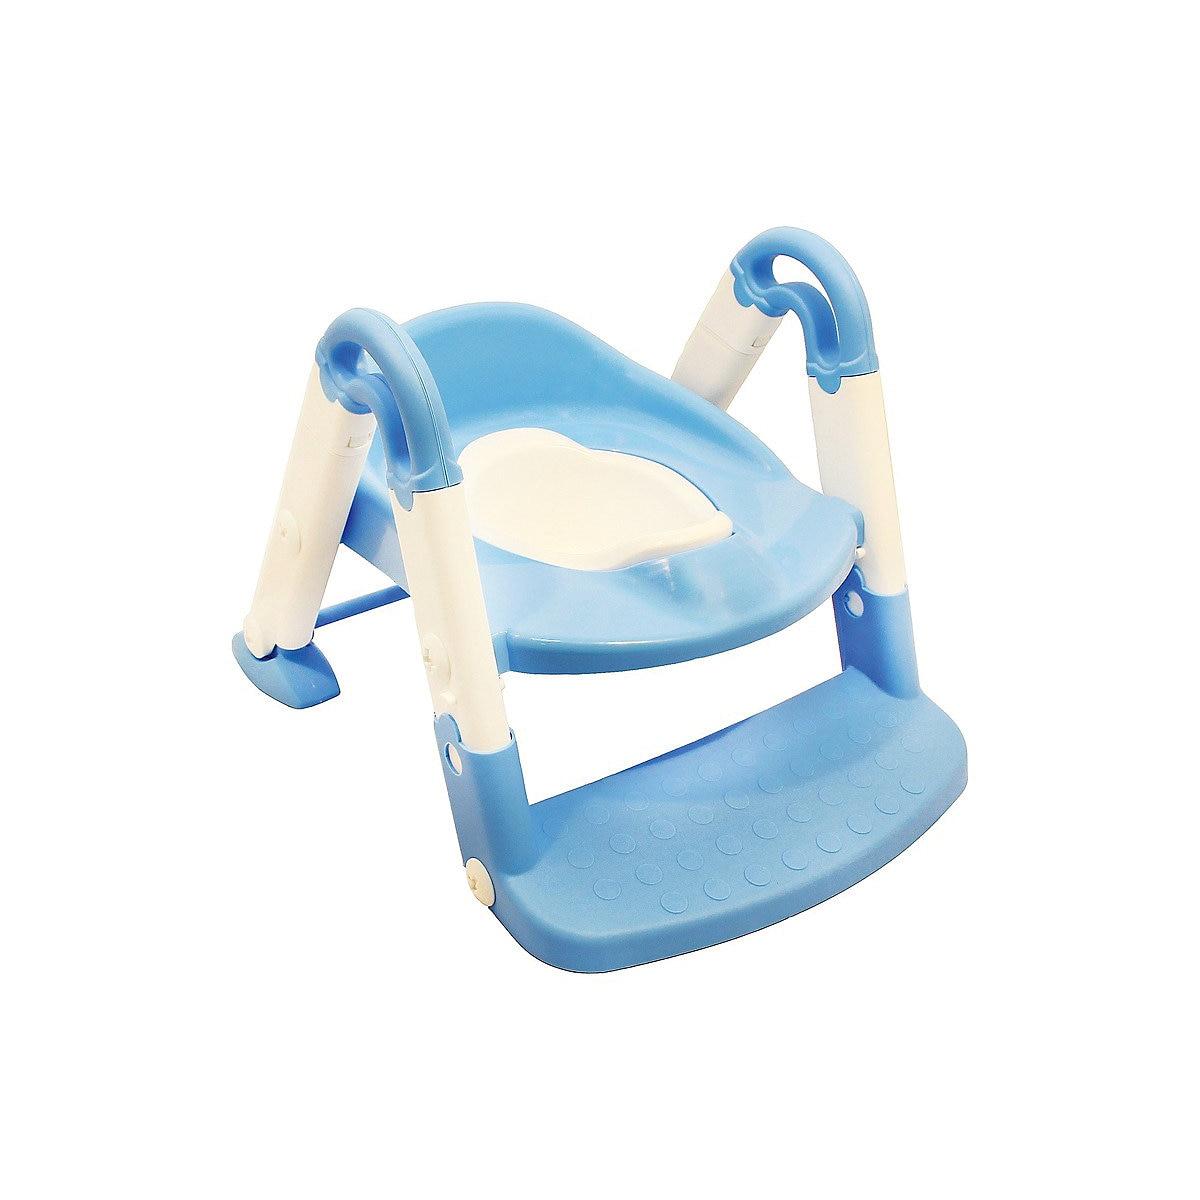 Potties & Seats ROXY-KIDS 5578867 Pot Children's Travel Pots For Kids Pot Transformer For Boys And Girls